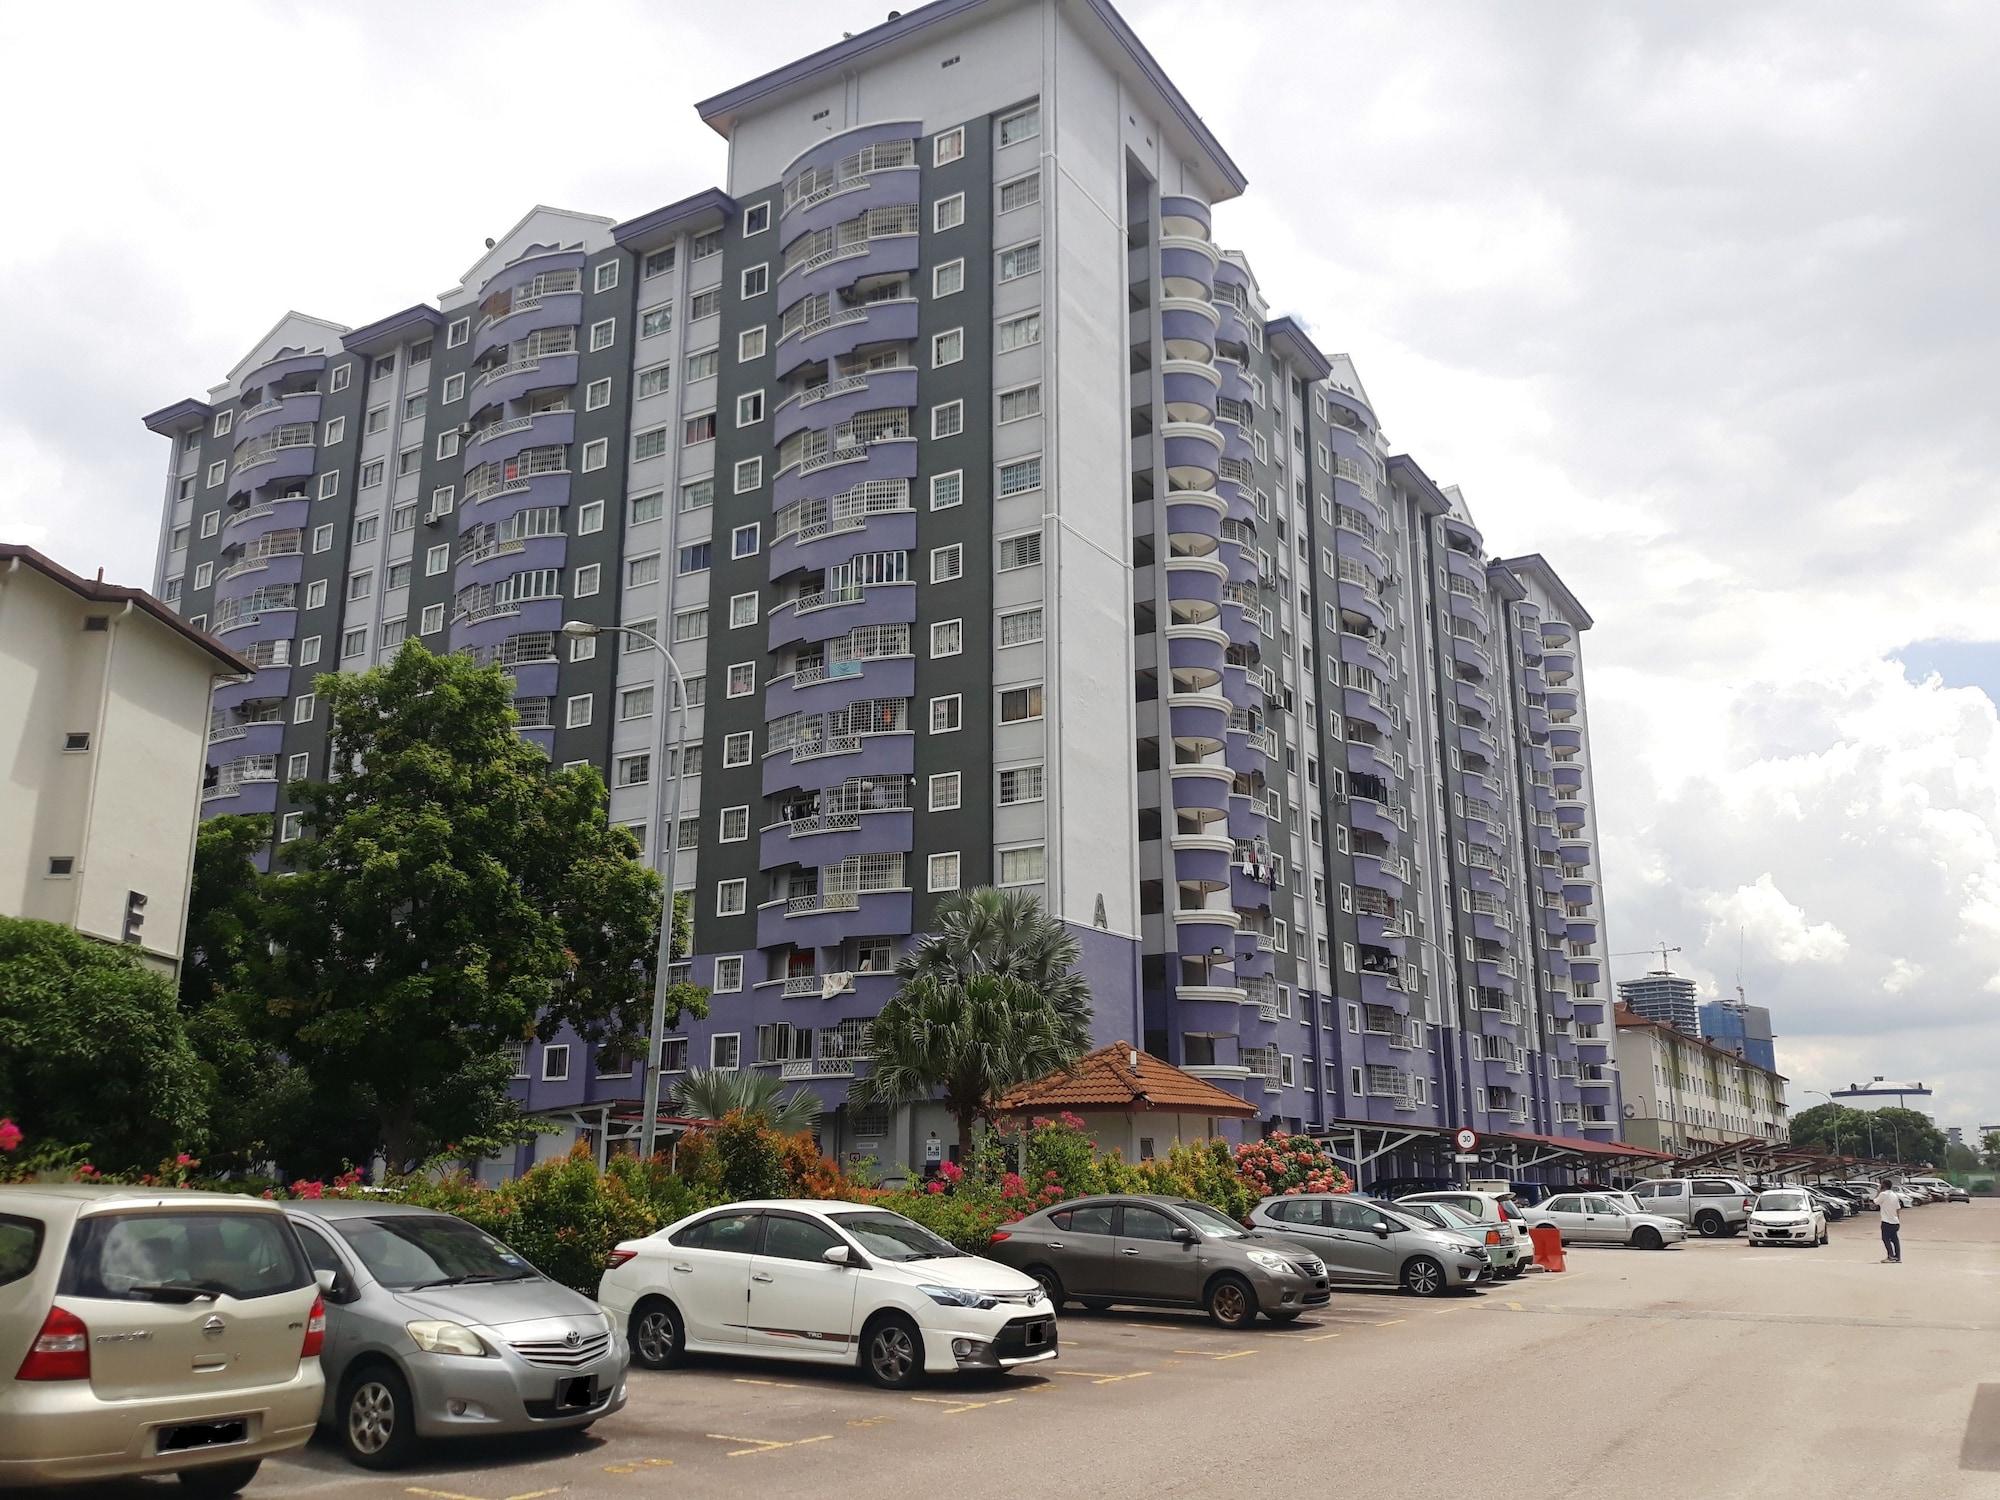 Gateway Malaysia - Johor Bahru, Johor Bahru